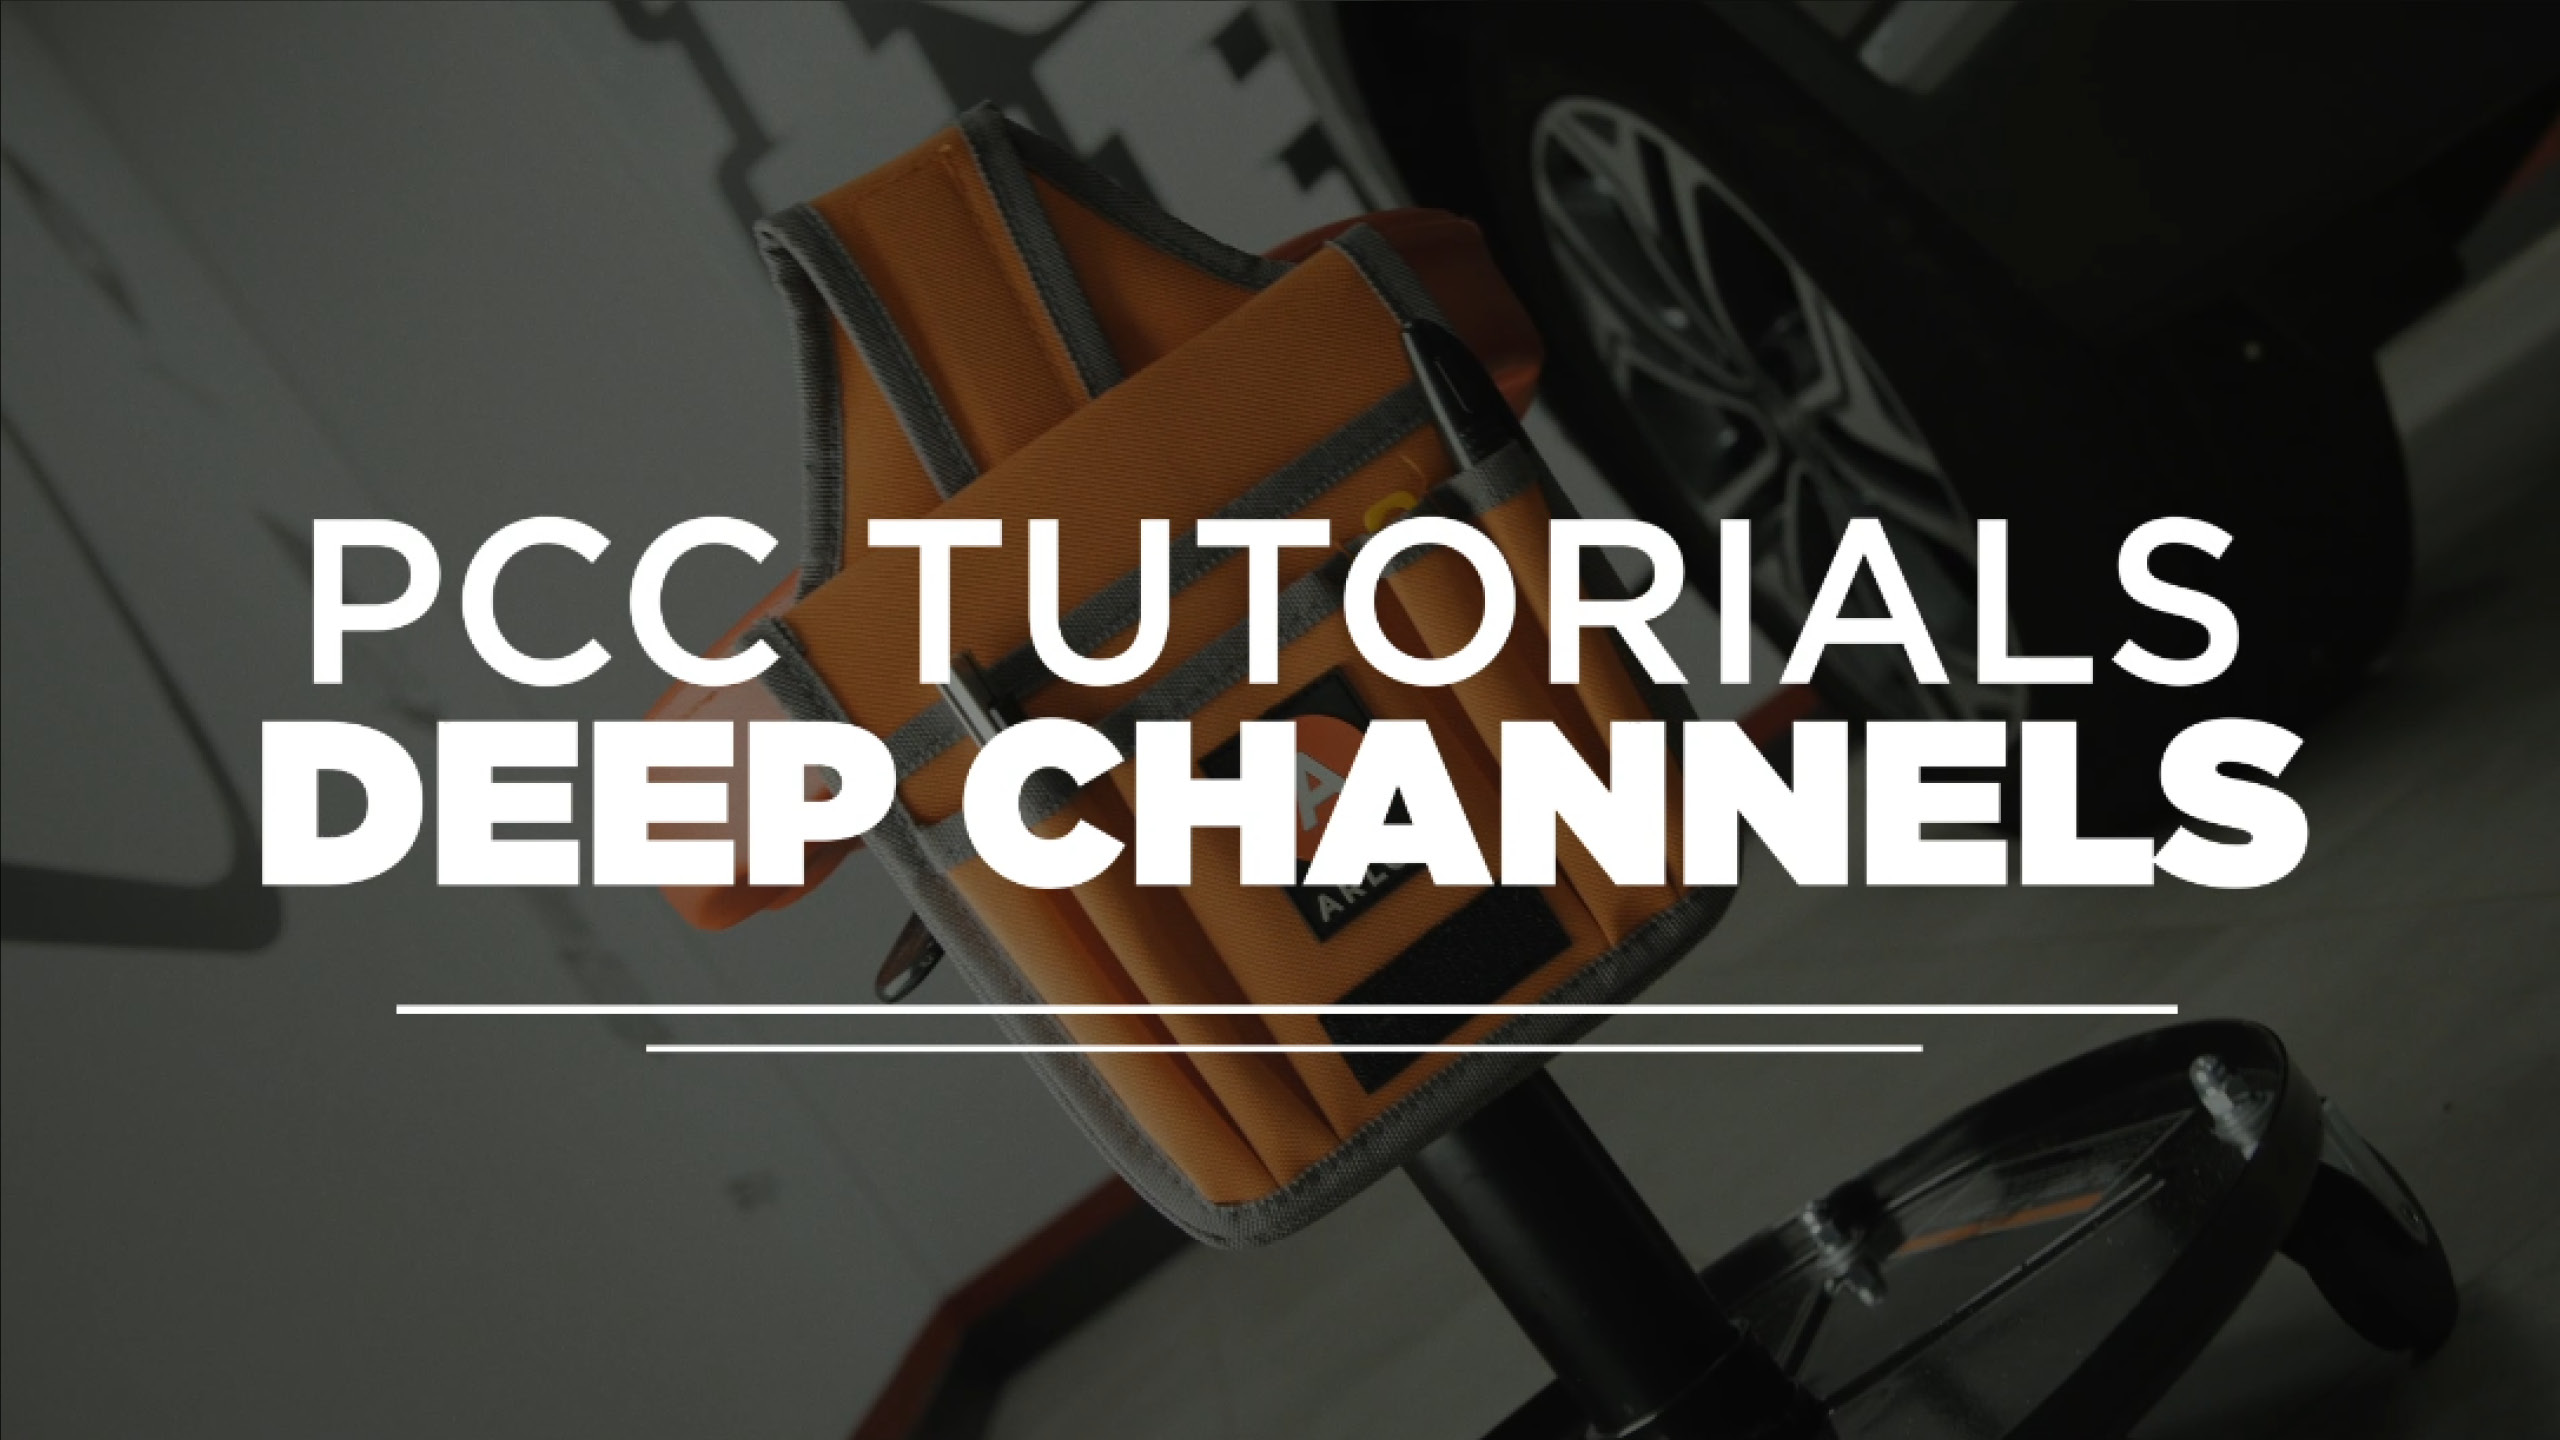 04 PCC Thumbnail DeepChannels